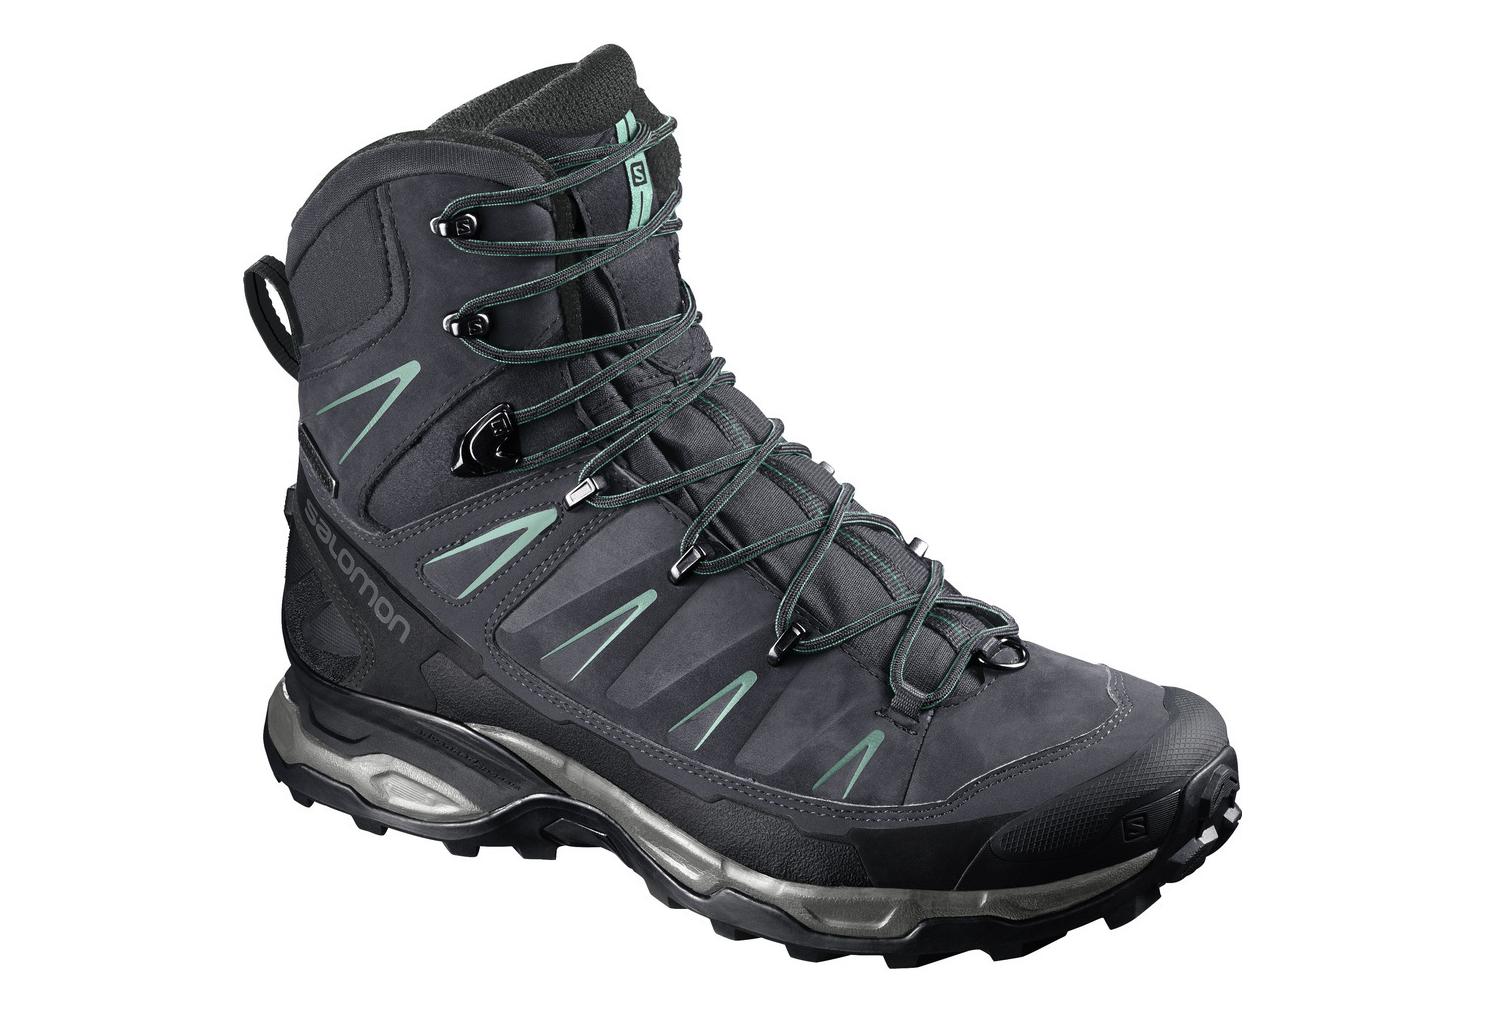 Trek Ultra Chaussures X Salomon Gtx Femme vwOm80nN